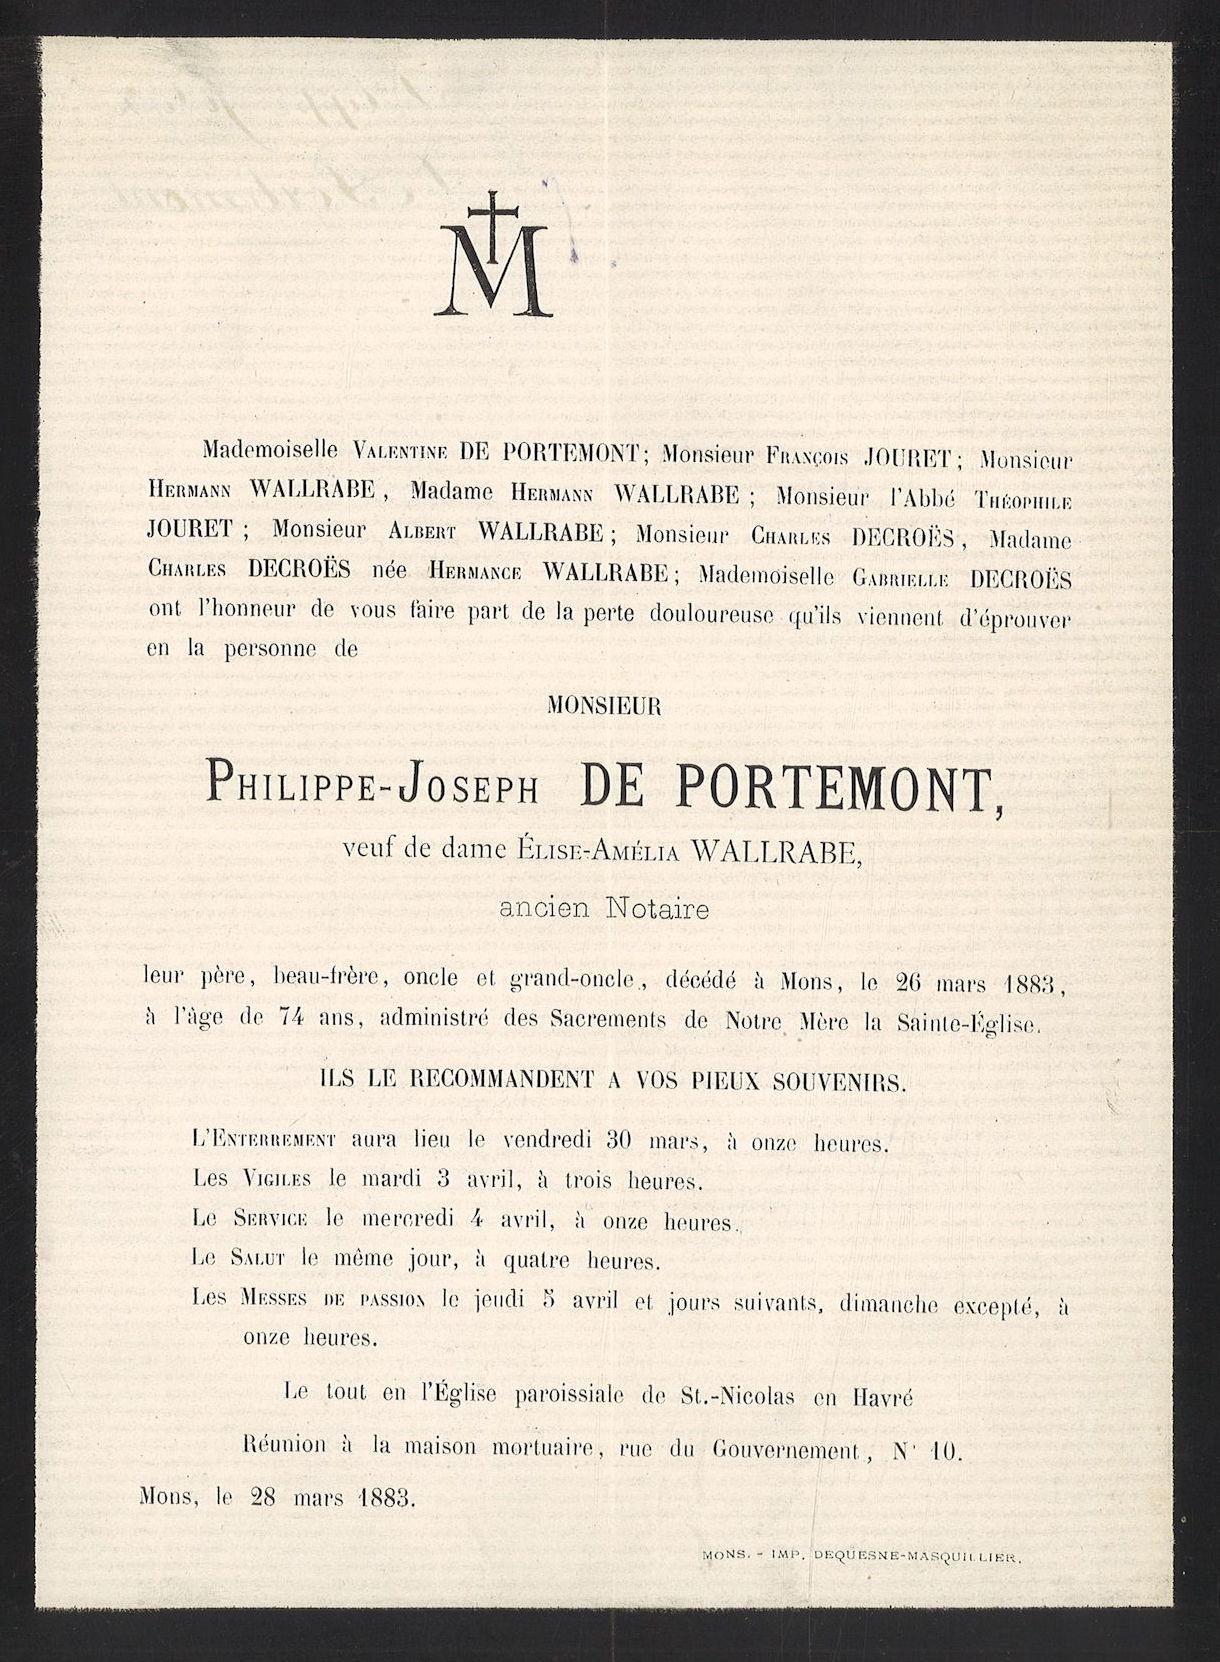 Philippe-Josep De Portemont